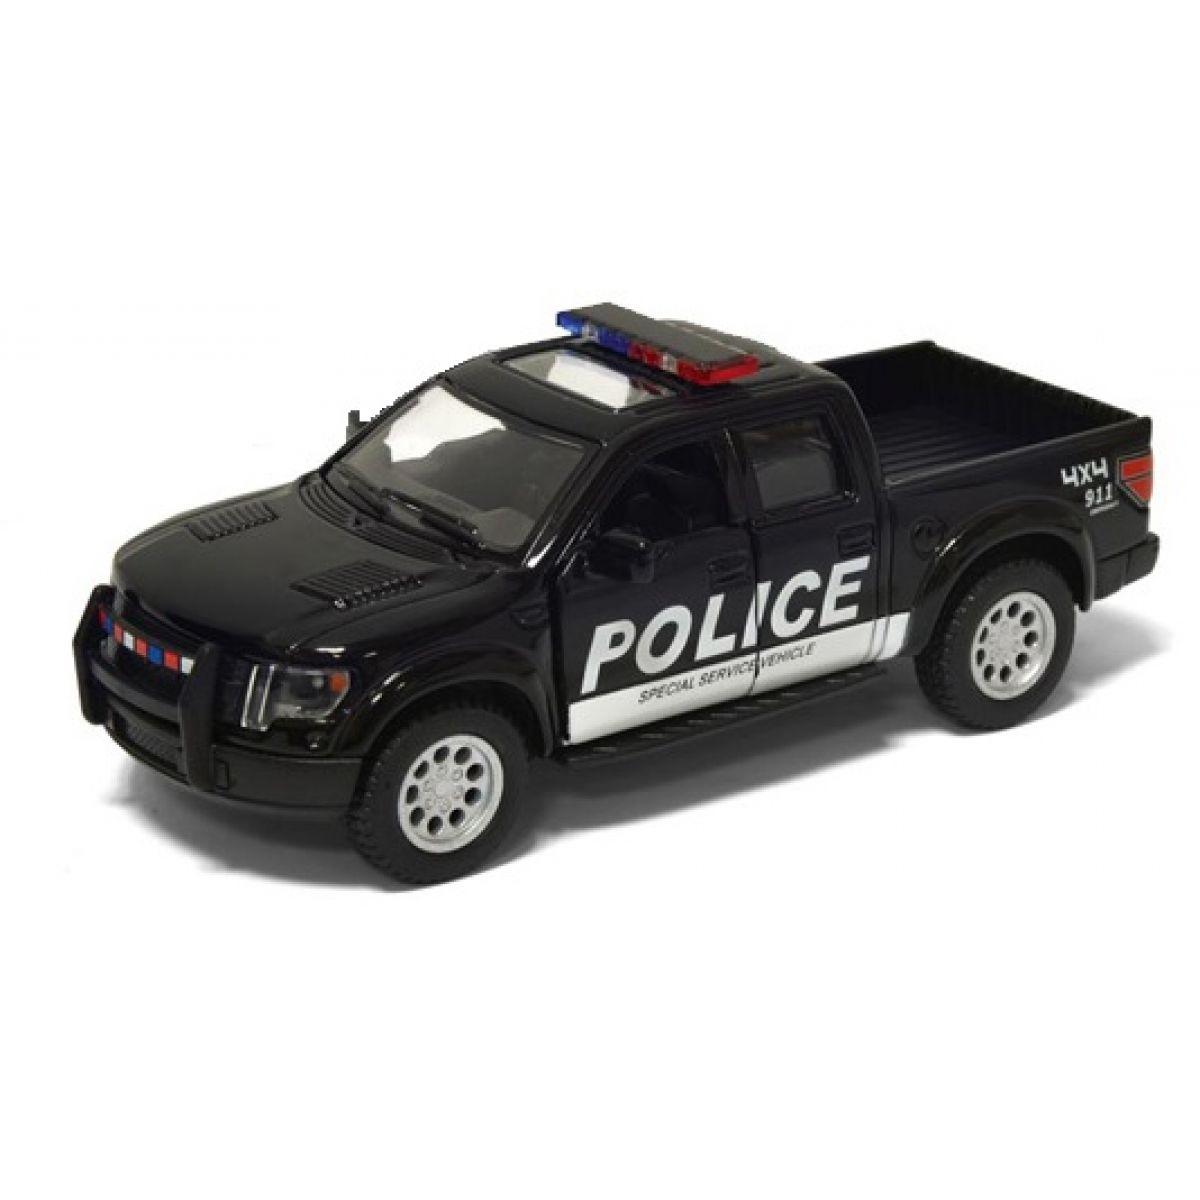 HM Studio 2013 Ford F-150 SVT Raptor SuperCrew polície